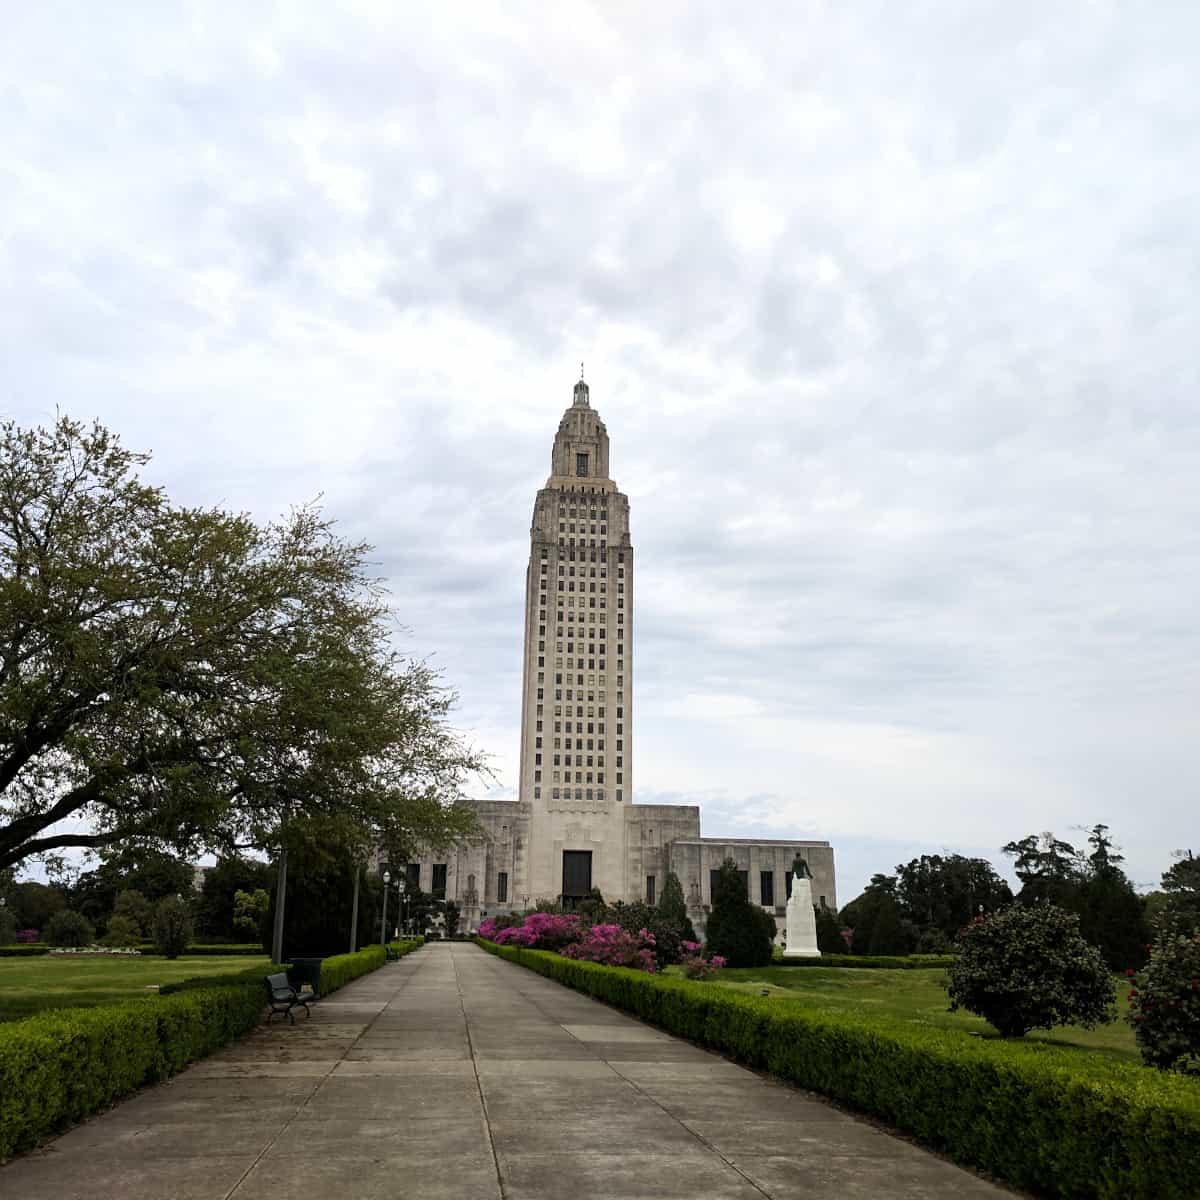 Louisiana State Capital Baton Rouge